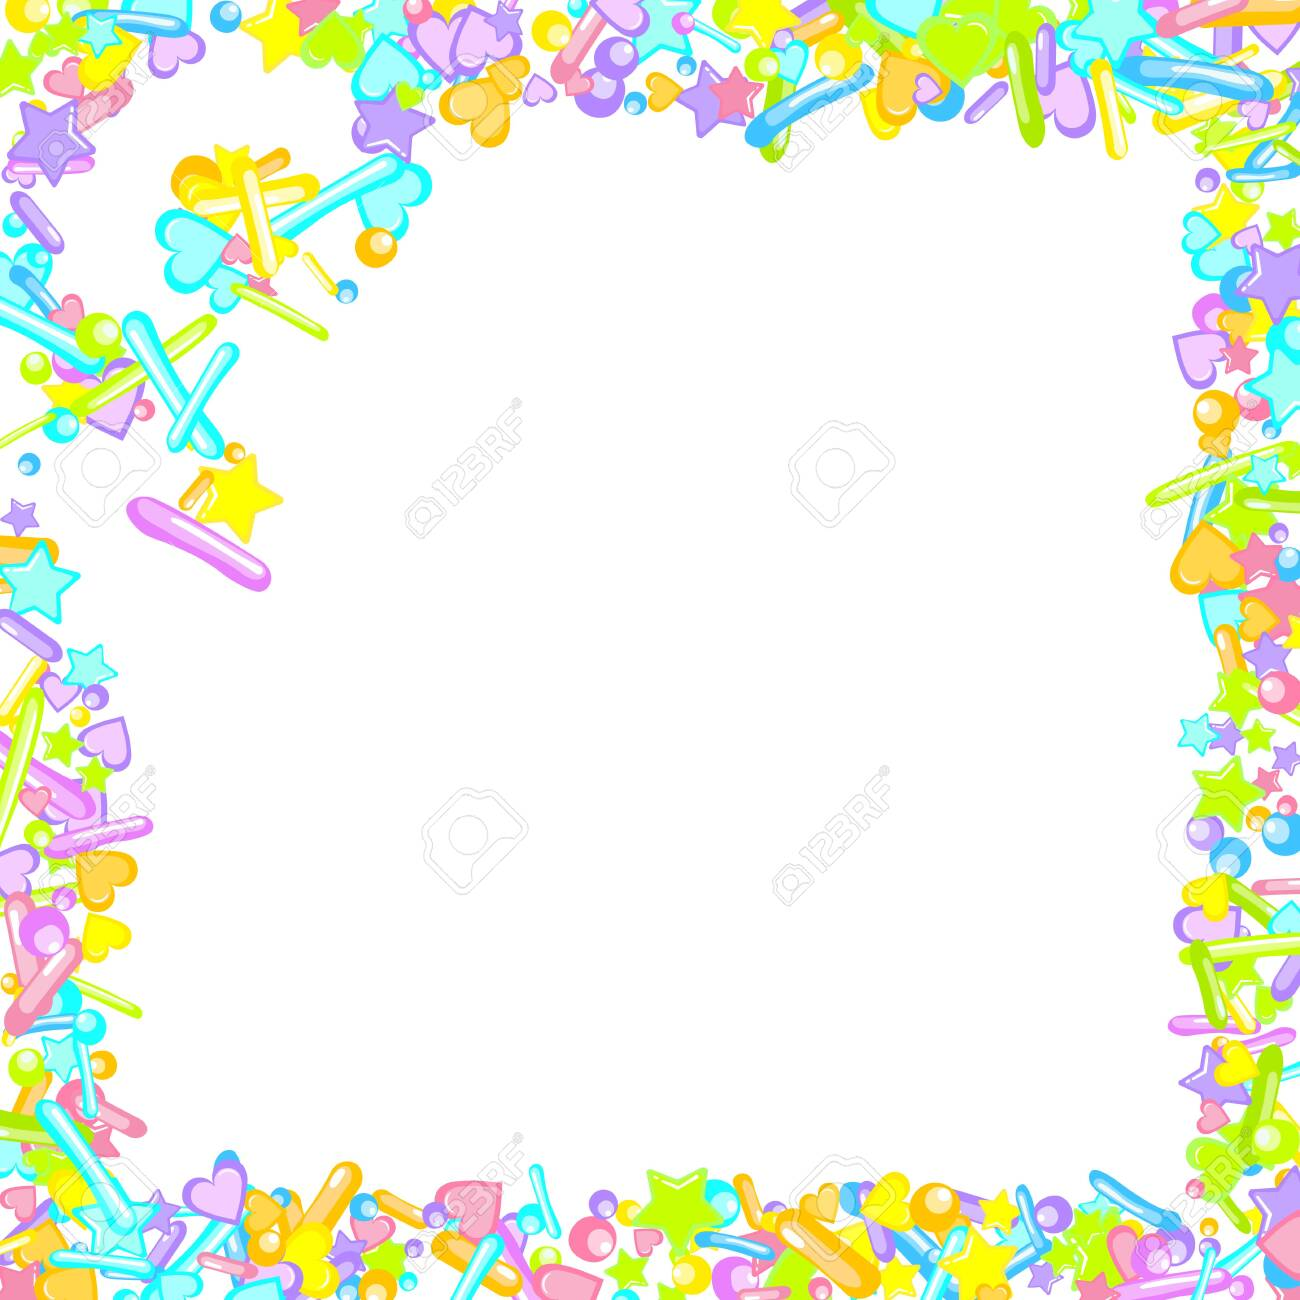 Sprinkles grainy. Cupcake donuts, dessert, sugar, bakery background. Sweet confetti on white chocolate glaze background. Vector Illustration sprinkles holiday designs, party, birthday, invitation. - 136172936